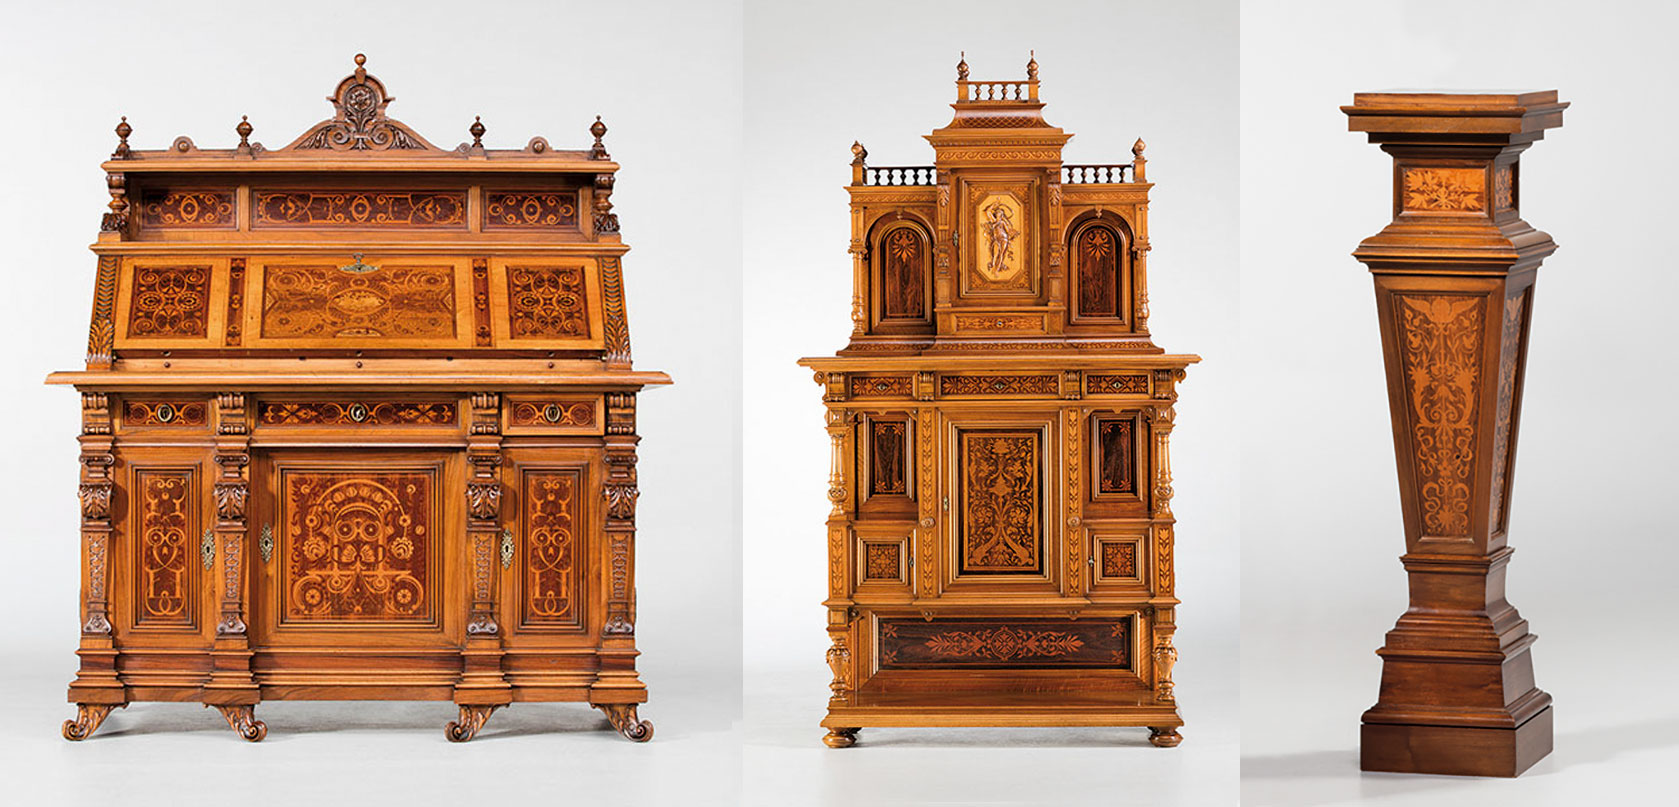 antike m bel biedermeierm bel kunsthandel und antiquit ten georg britsch antike m bel. Black Bedroom Furniture Sets. Home Design Ideas